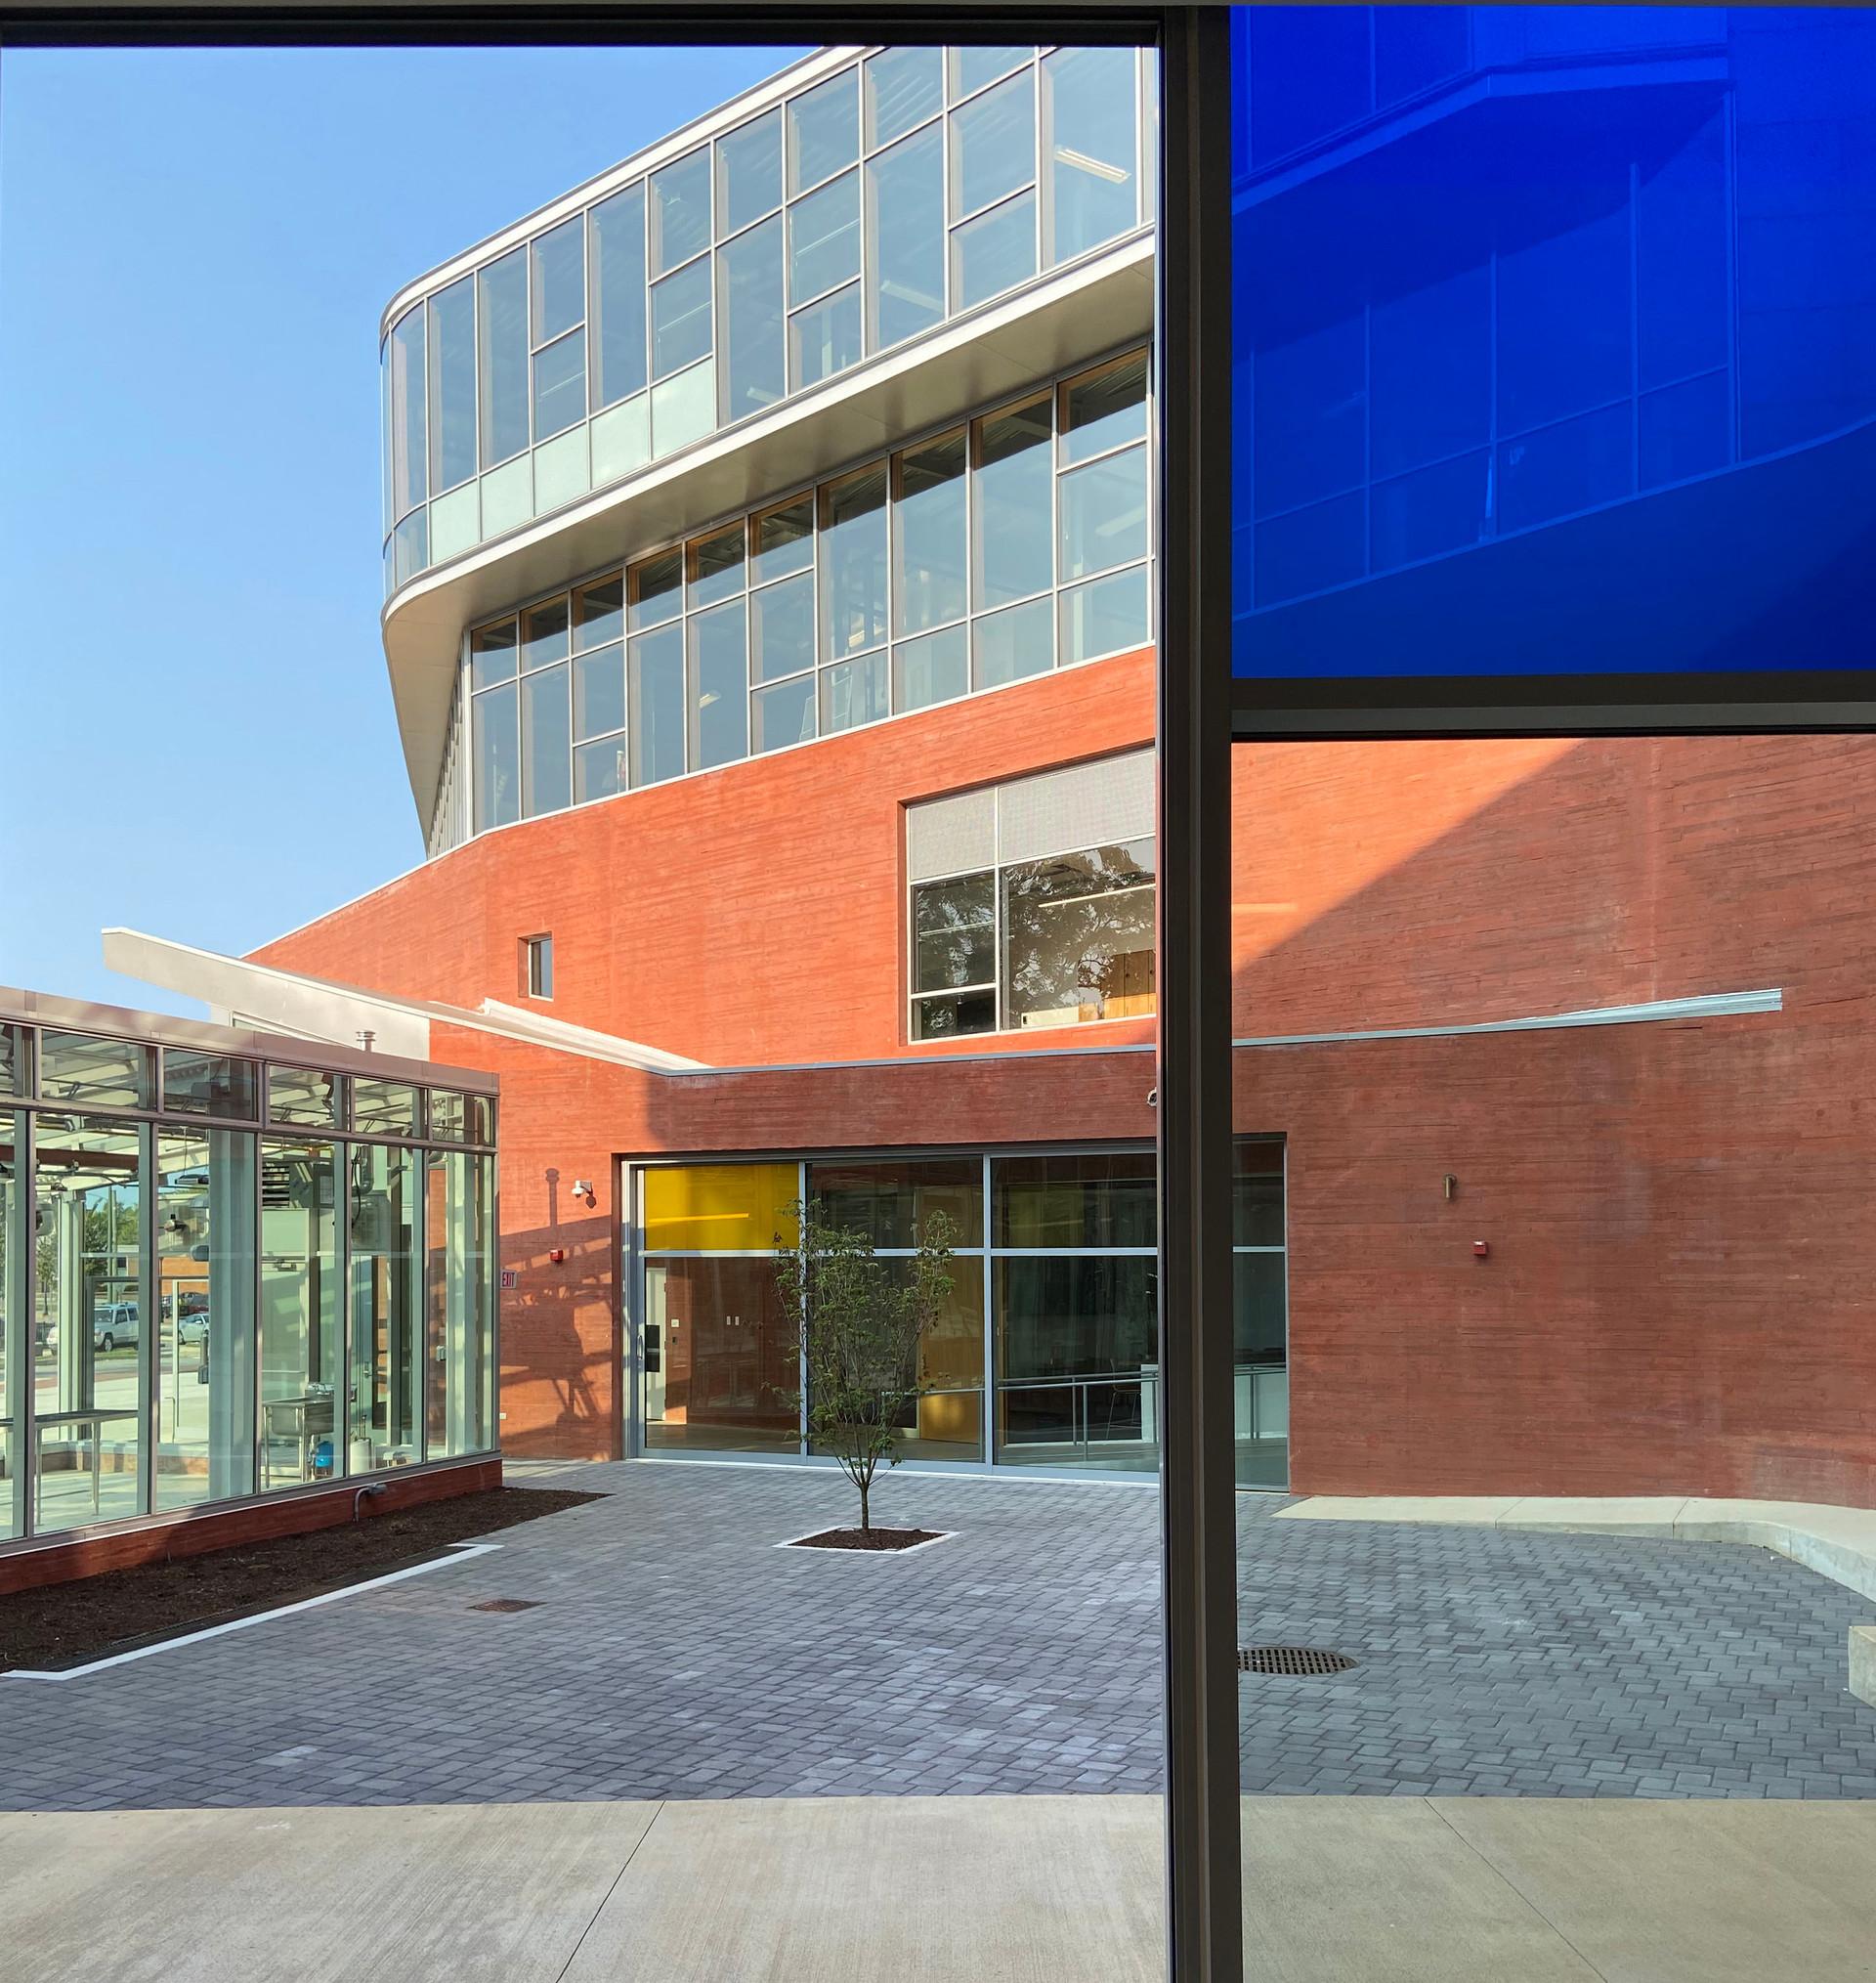 The Culinary School is organized in a two-storey 'U' around a social courtyard